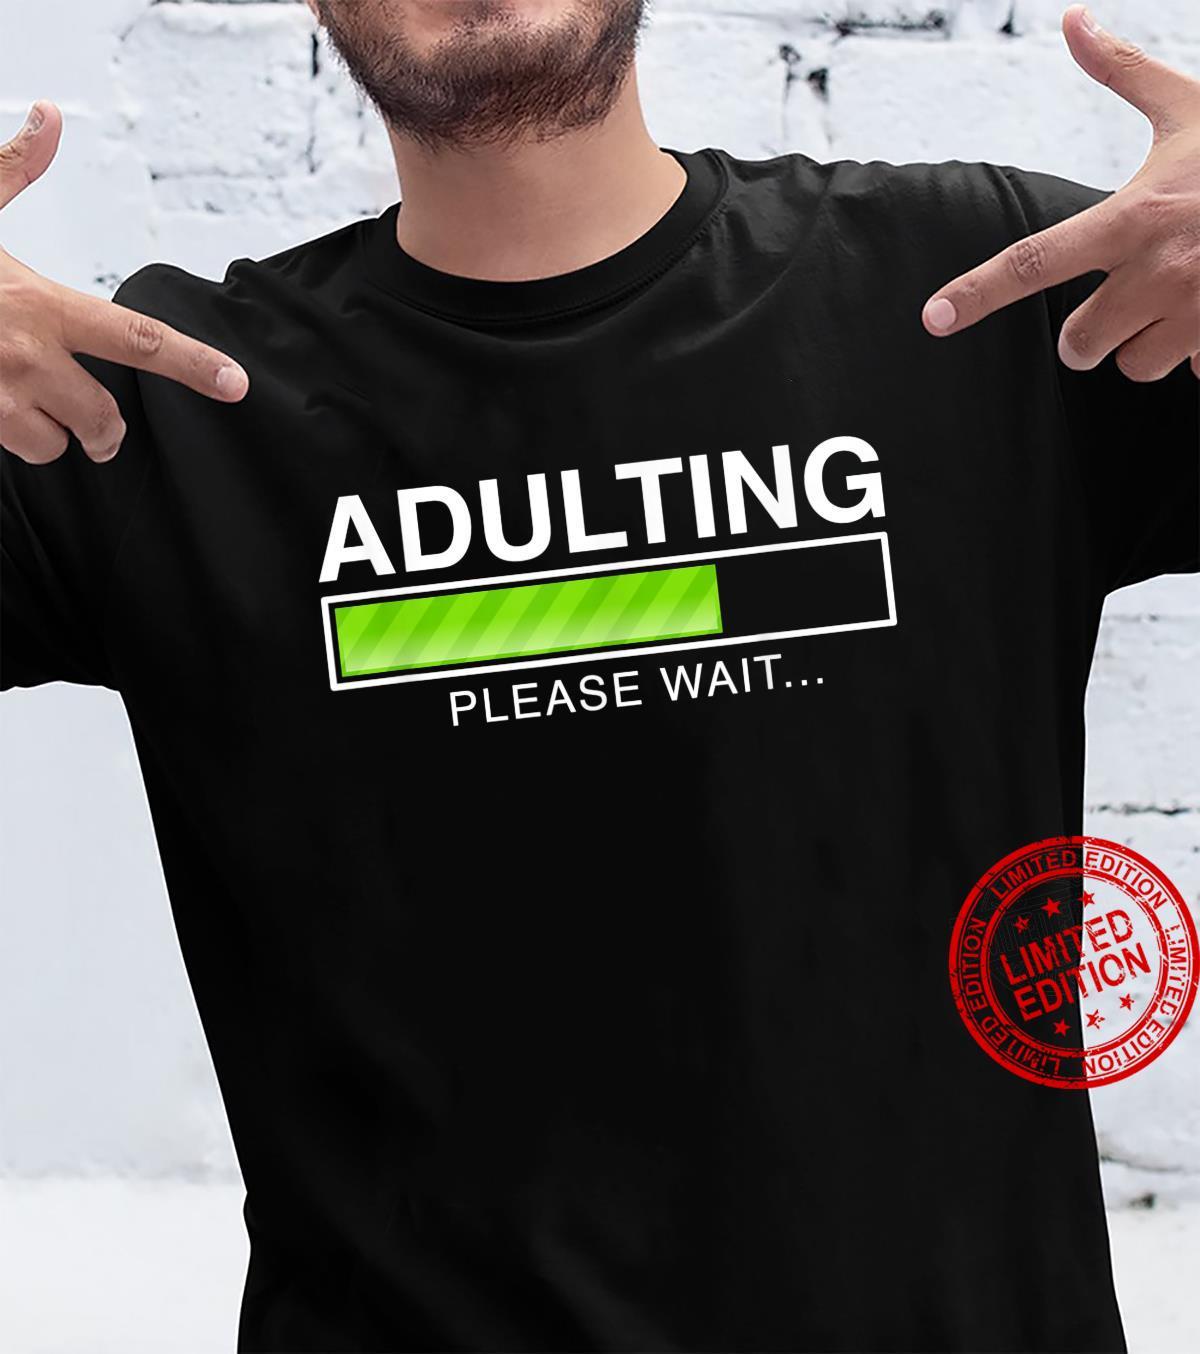 Adulting please wait adult saying, joke, sarcasm Shirt